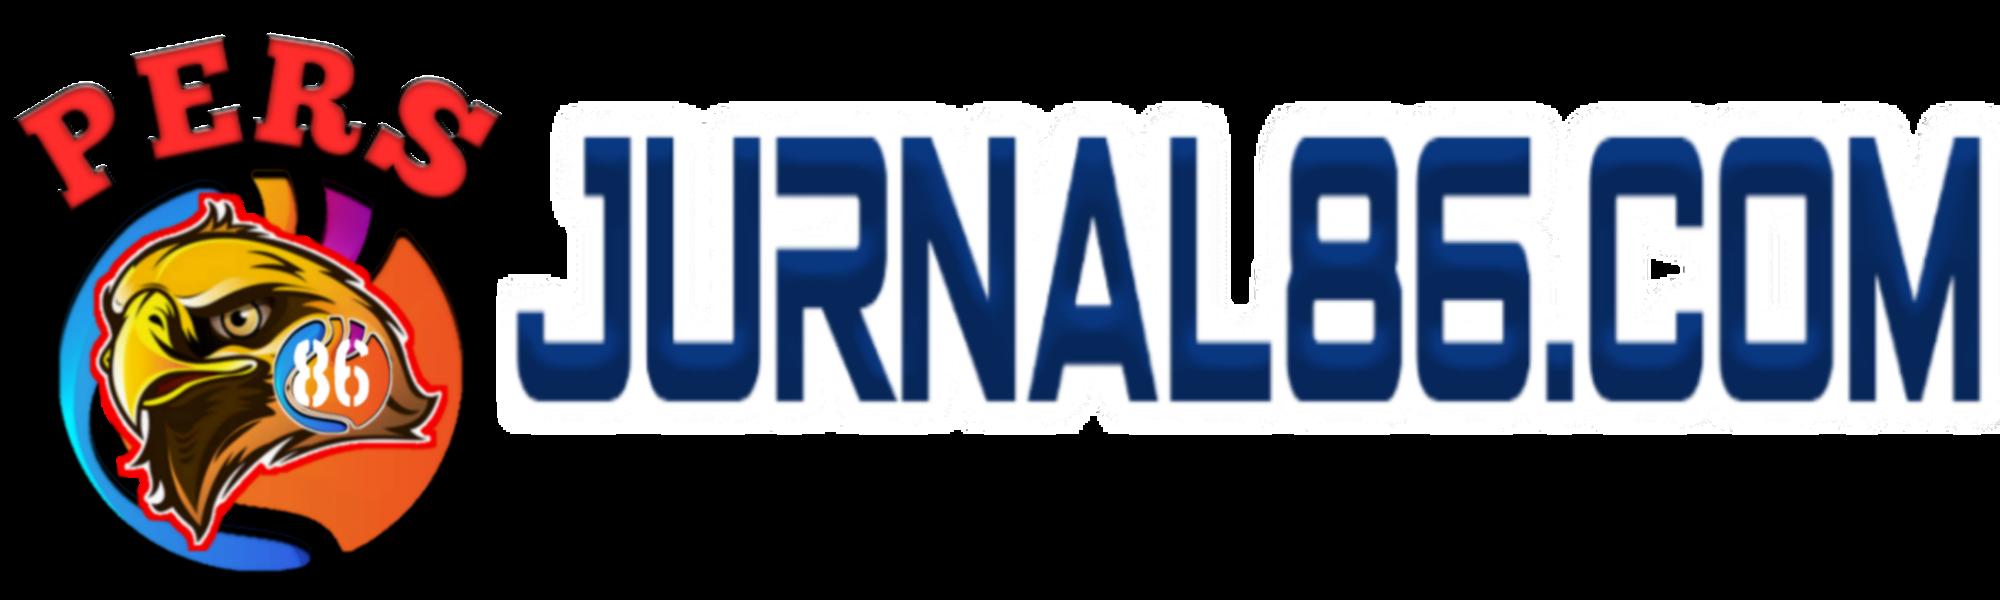 JURNAL86.COM